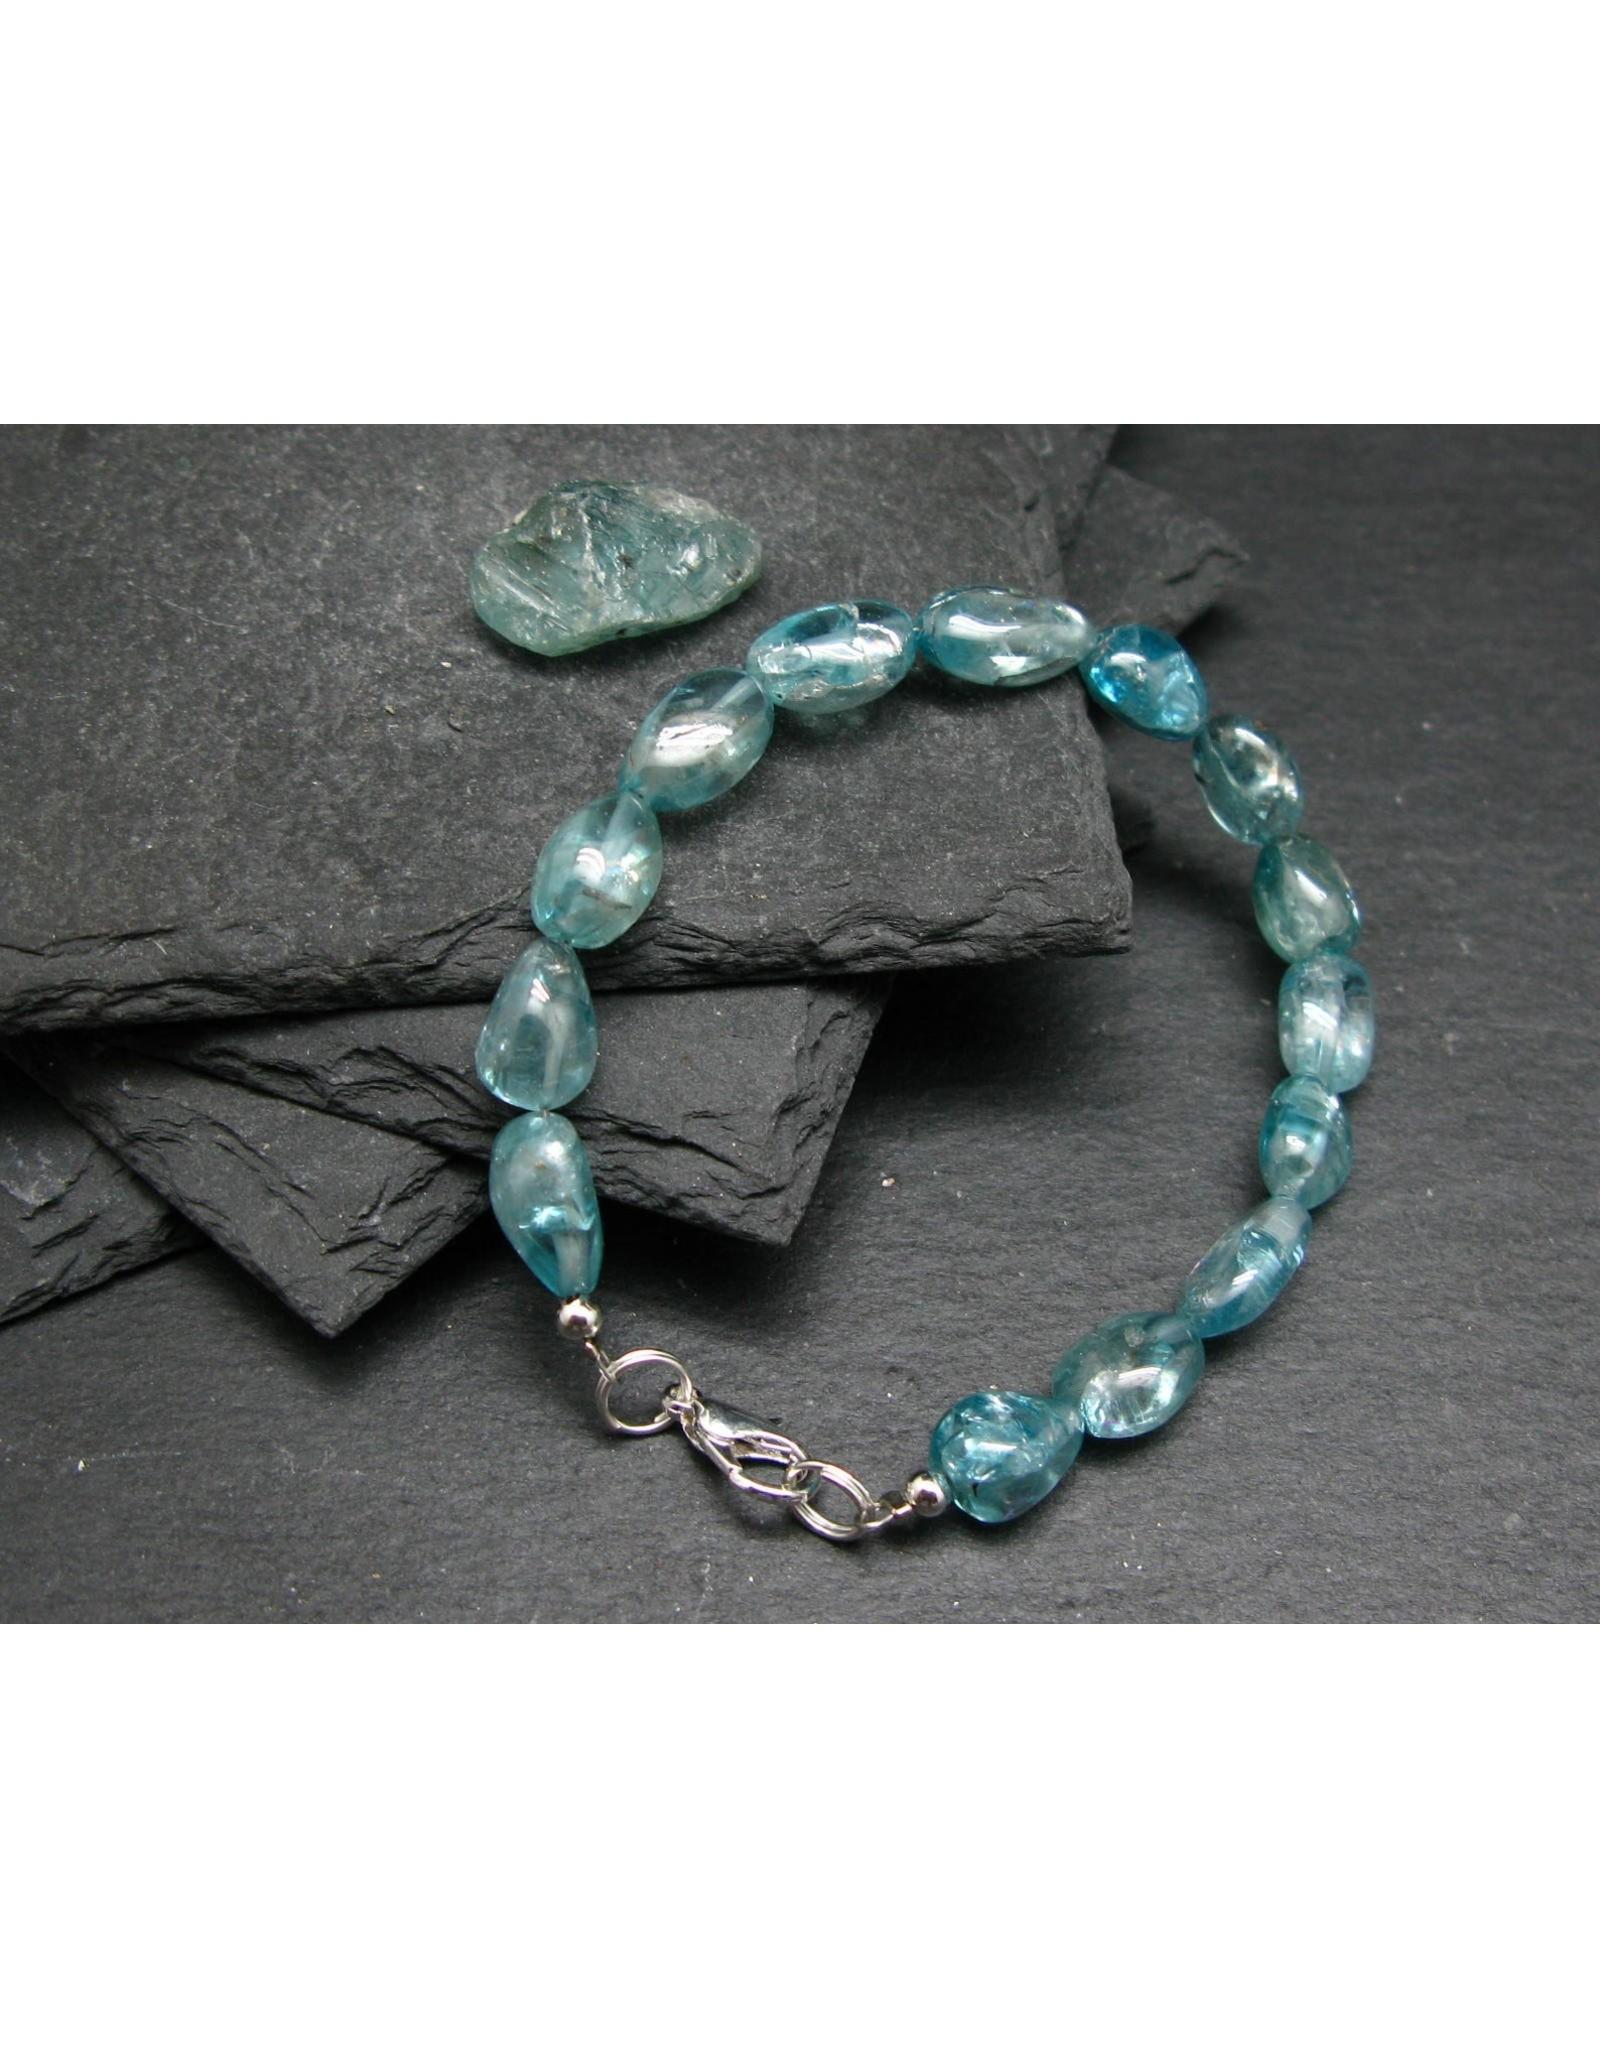 Blue Zircon Bracelet - 10mm Tumbled